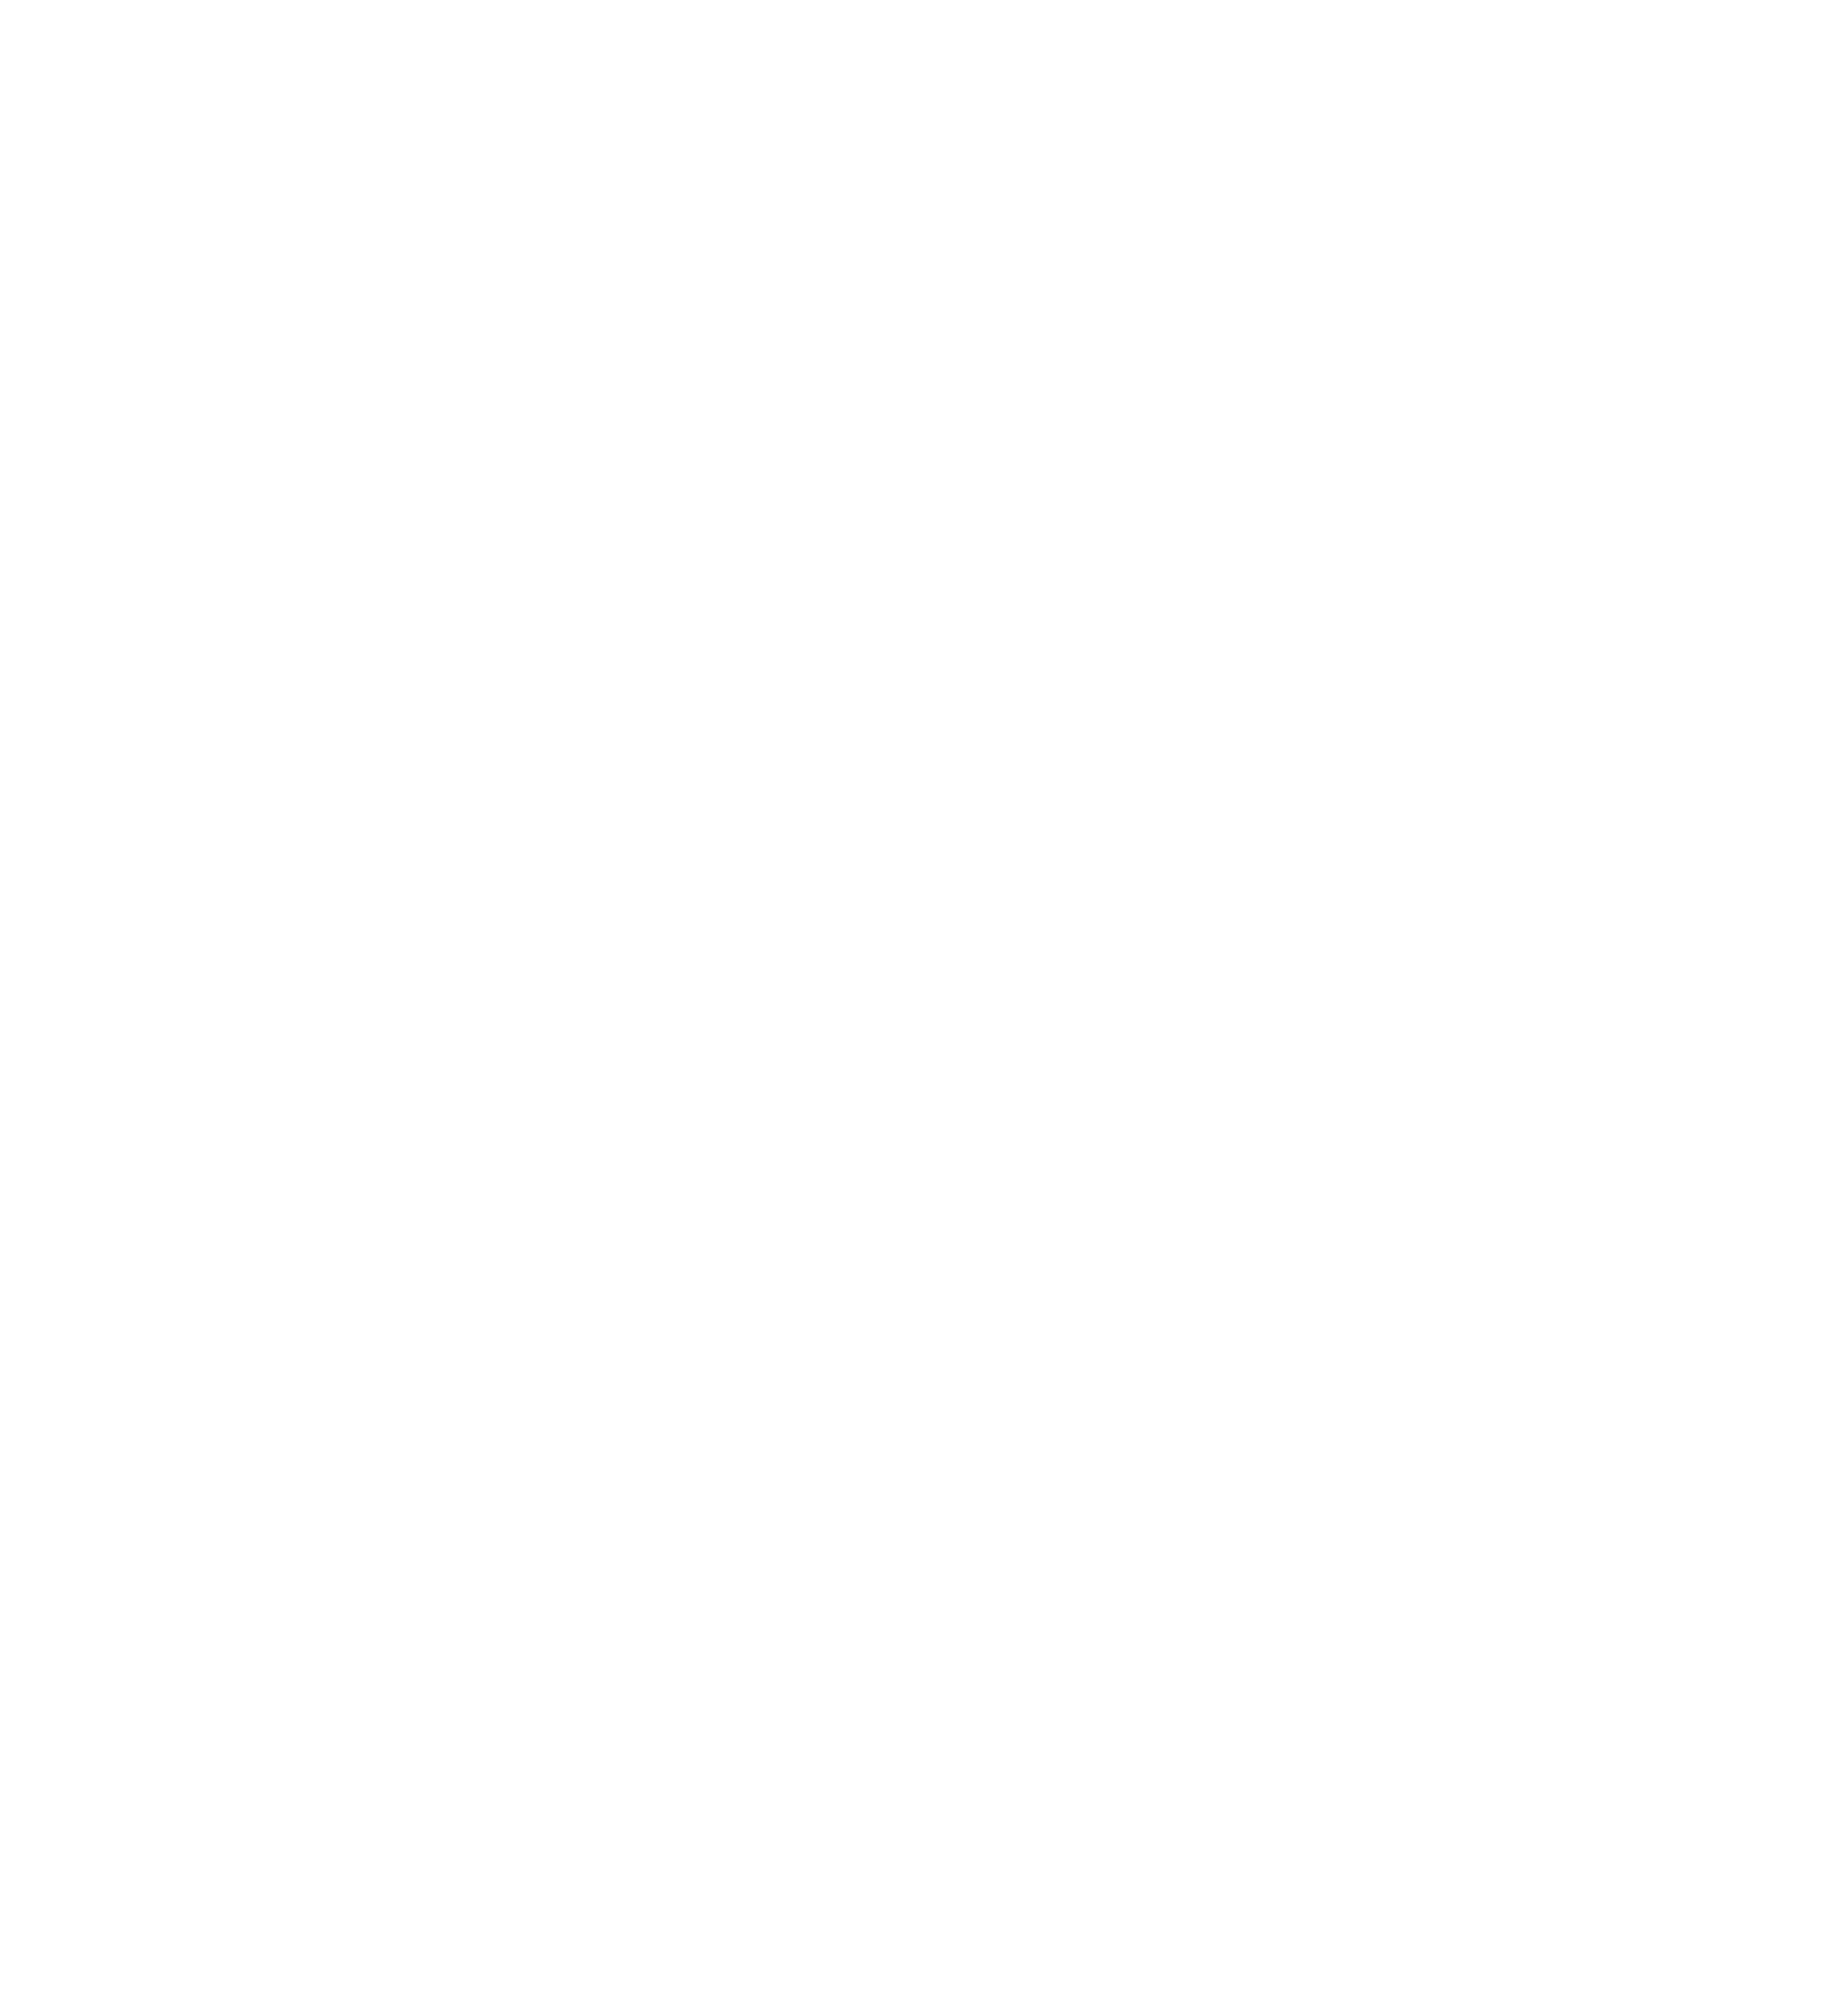 577d2135e3f0f32215813bc6_Africa universelle kondensatpumpe von refco refco condensate pump wiring diagram at edmiracle.co